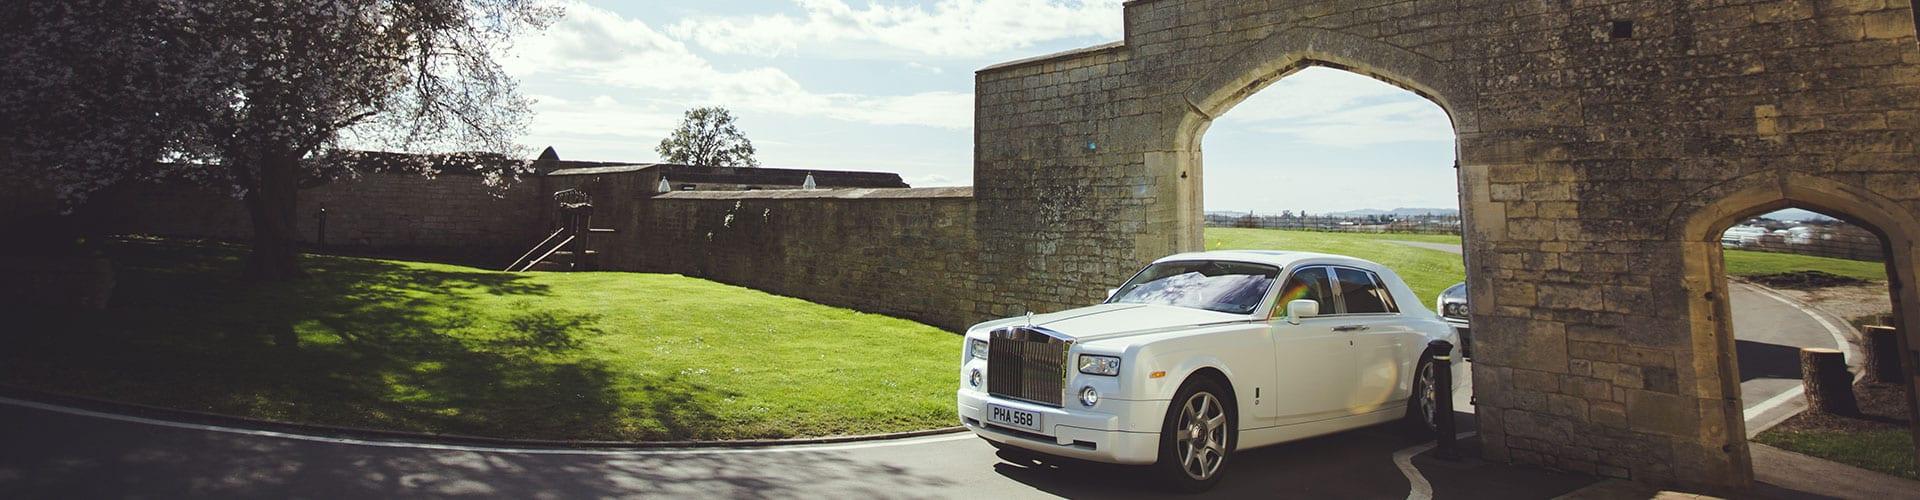 Rolls-Royce Phantom wedding car in pearlescent white